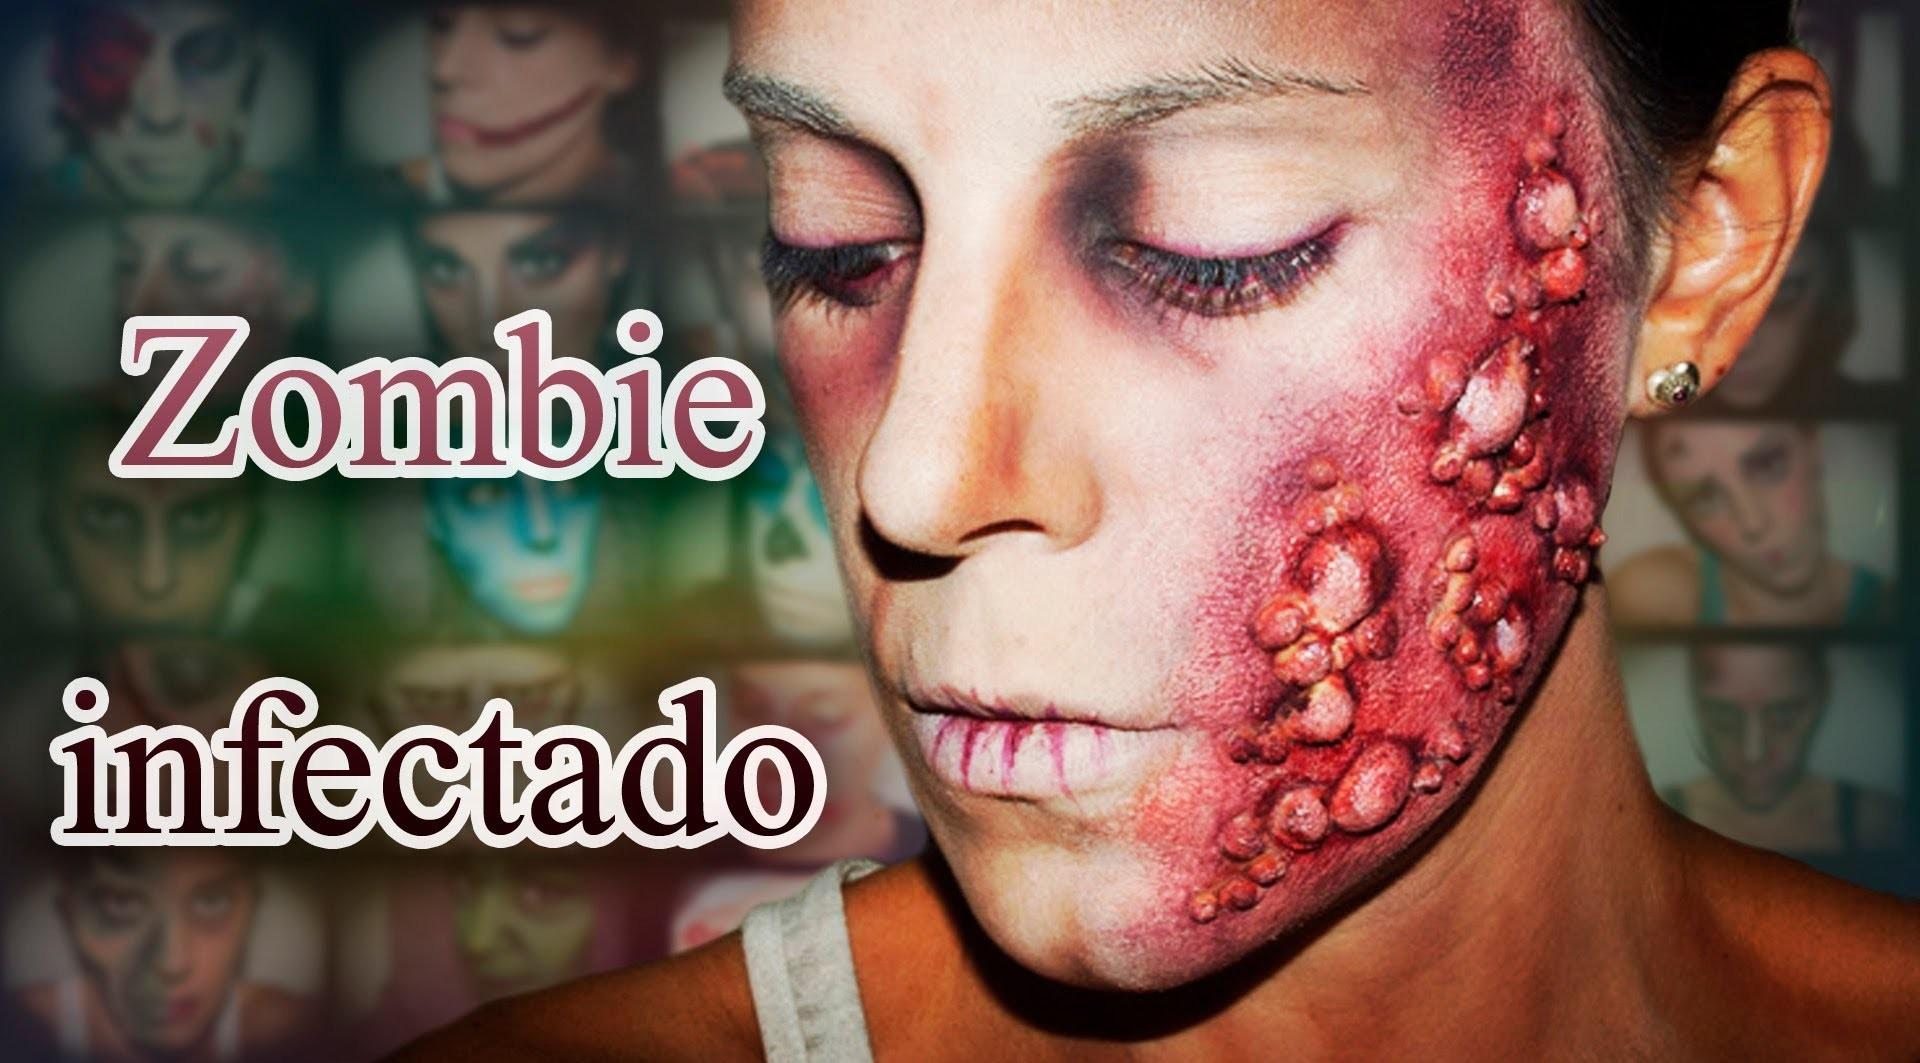 Maquillaje Halloween Zombie infectado Makeup FX #16 | Silvia Quiros